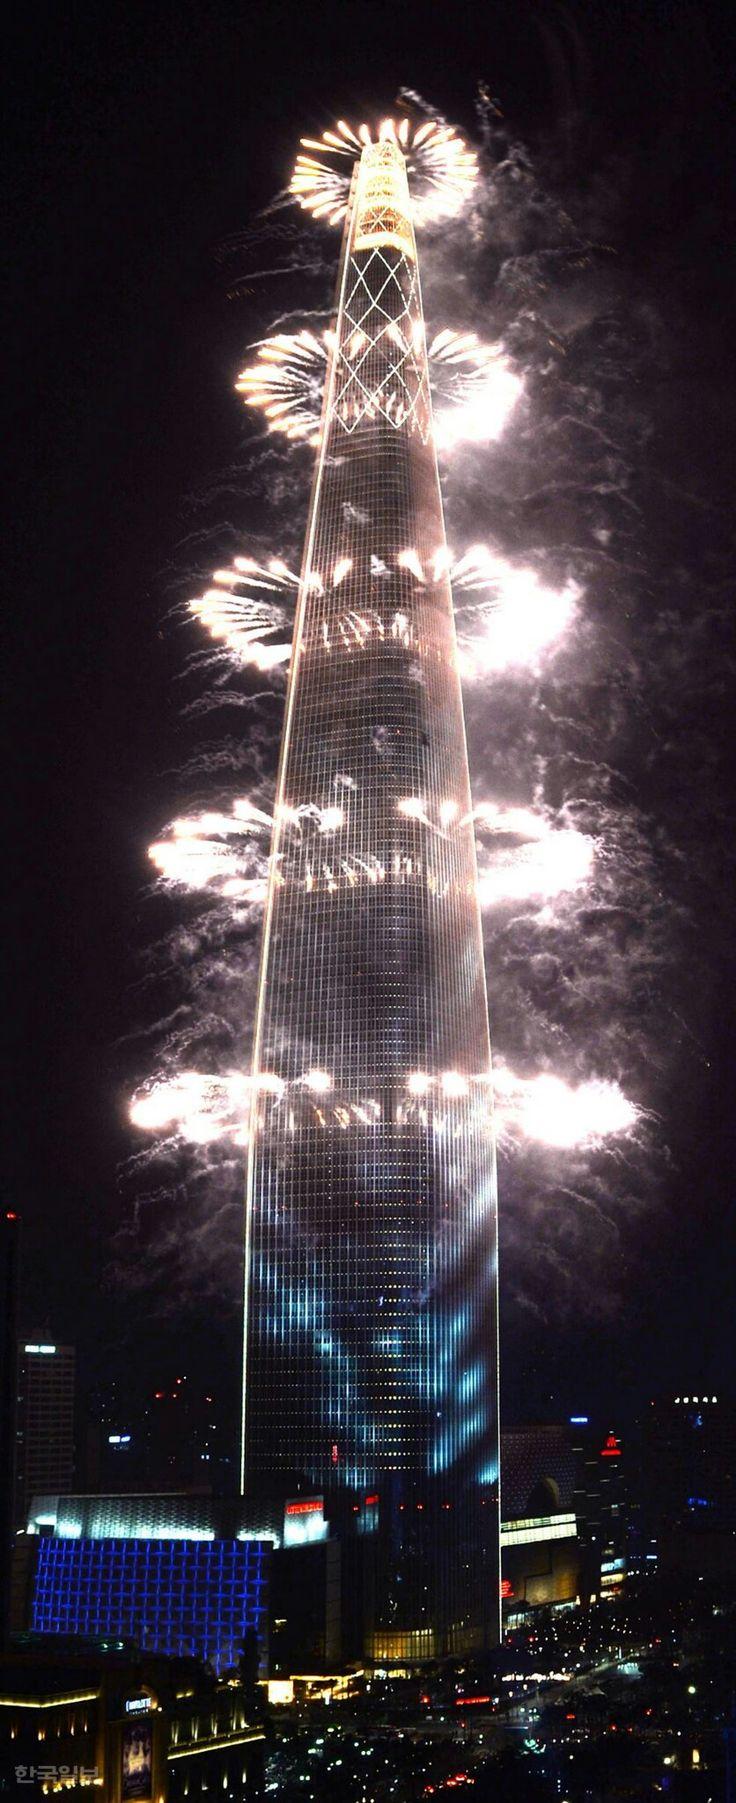 HAPPY NEW YEAR 2018  | Seoul Lotte World Tower | Korea